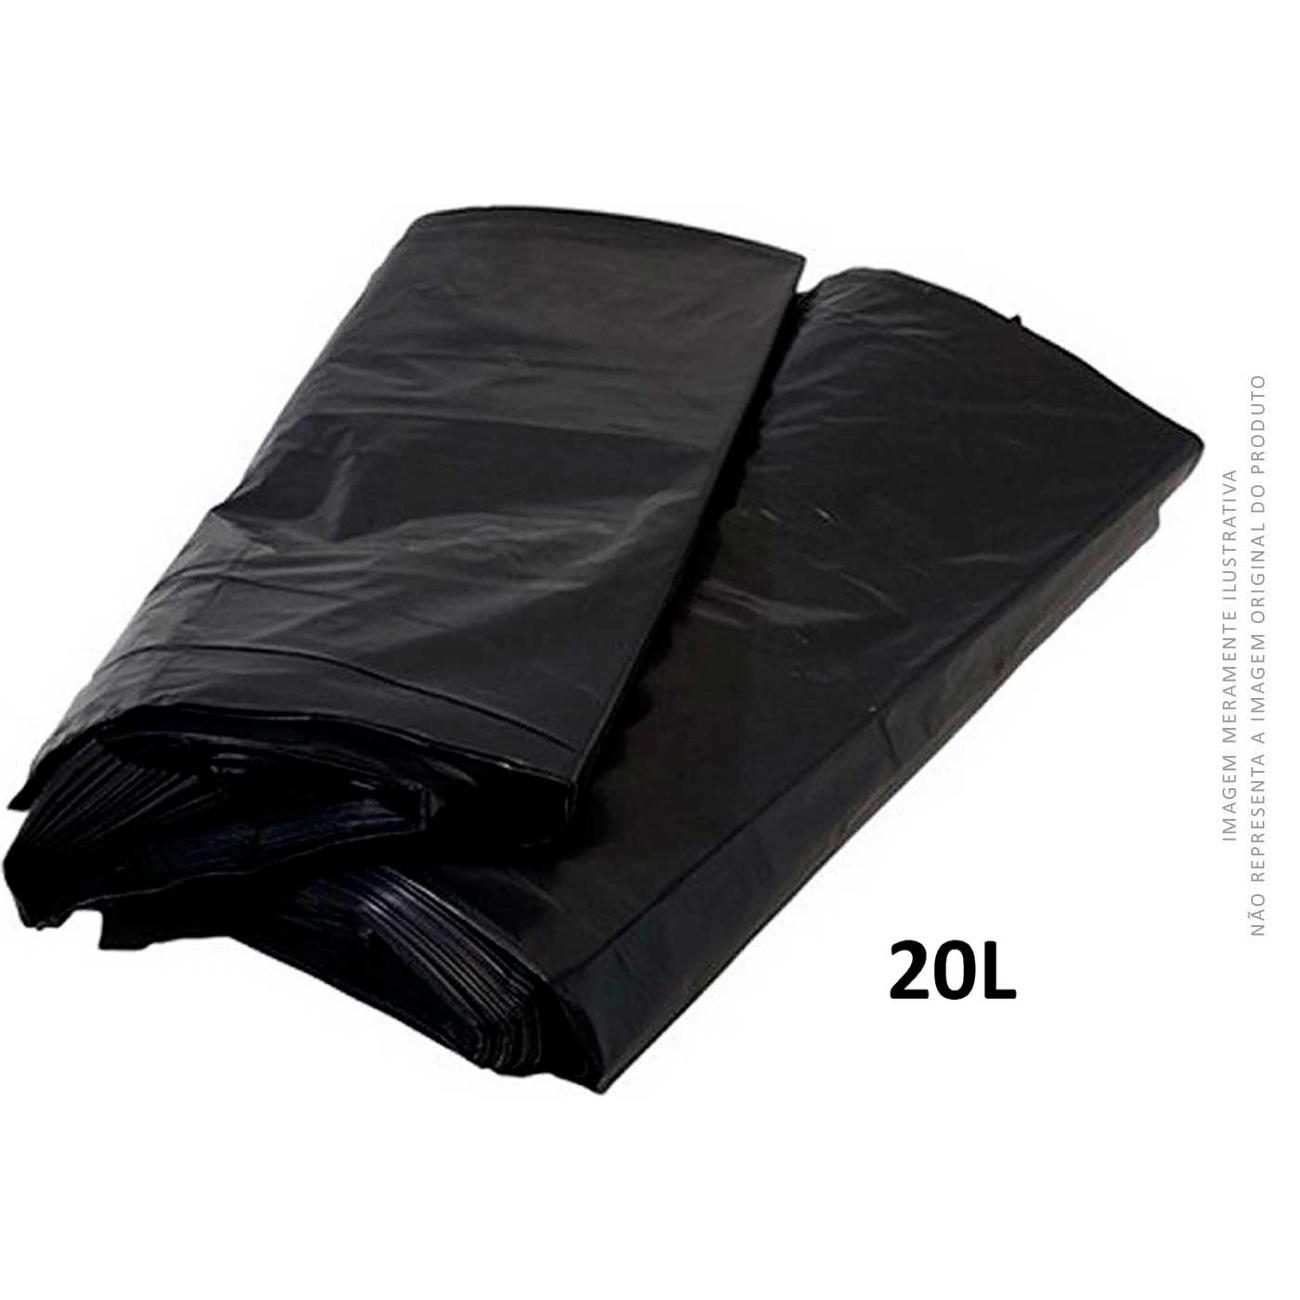 Saco De Lixo Preto MuLlixo 20L  | Caixa com 15 unidades